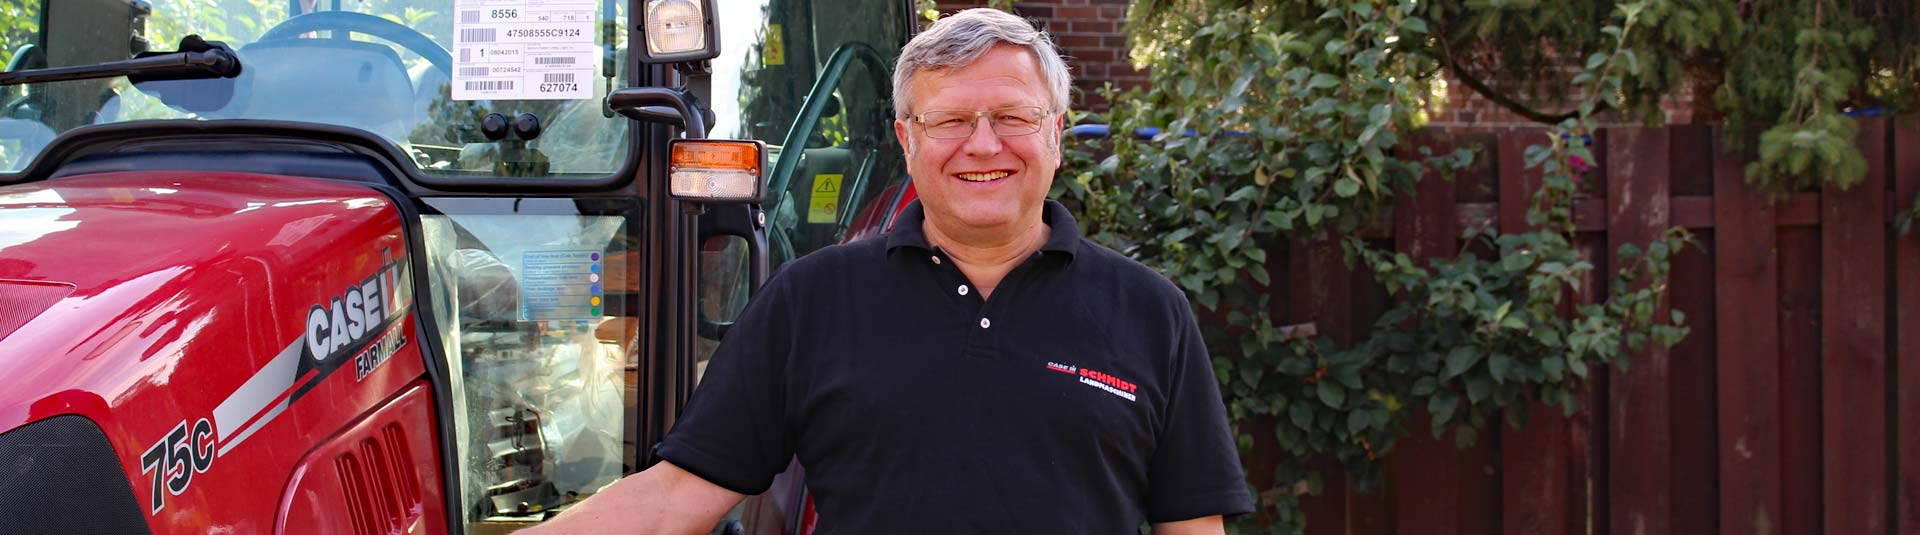 Schmidt Landmaschinen Steimke - Kontakt - Headerbild